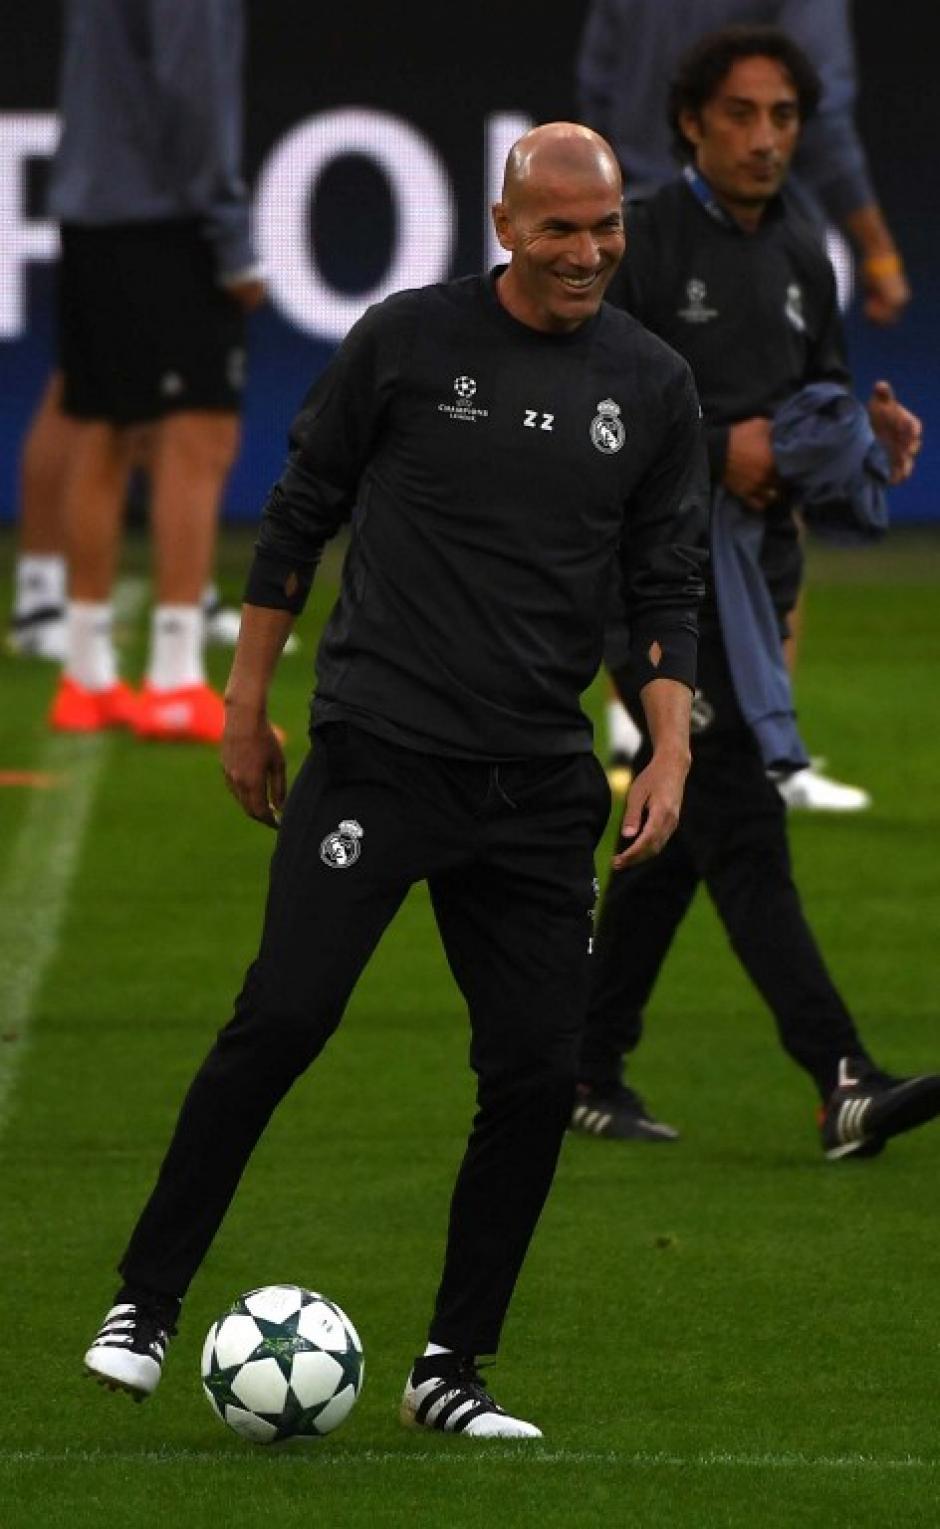 Zidane se divirtió en la última práctica del Madrid, previo a la jornada de Champions. (Foto: AFP)